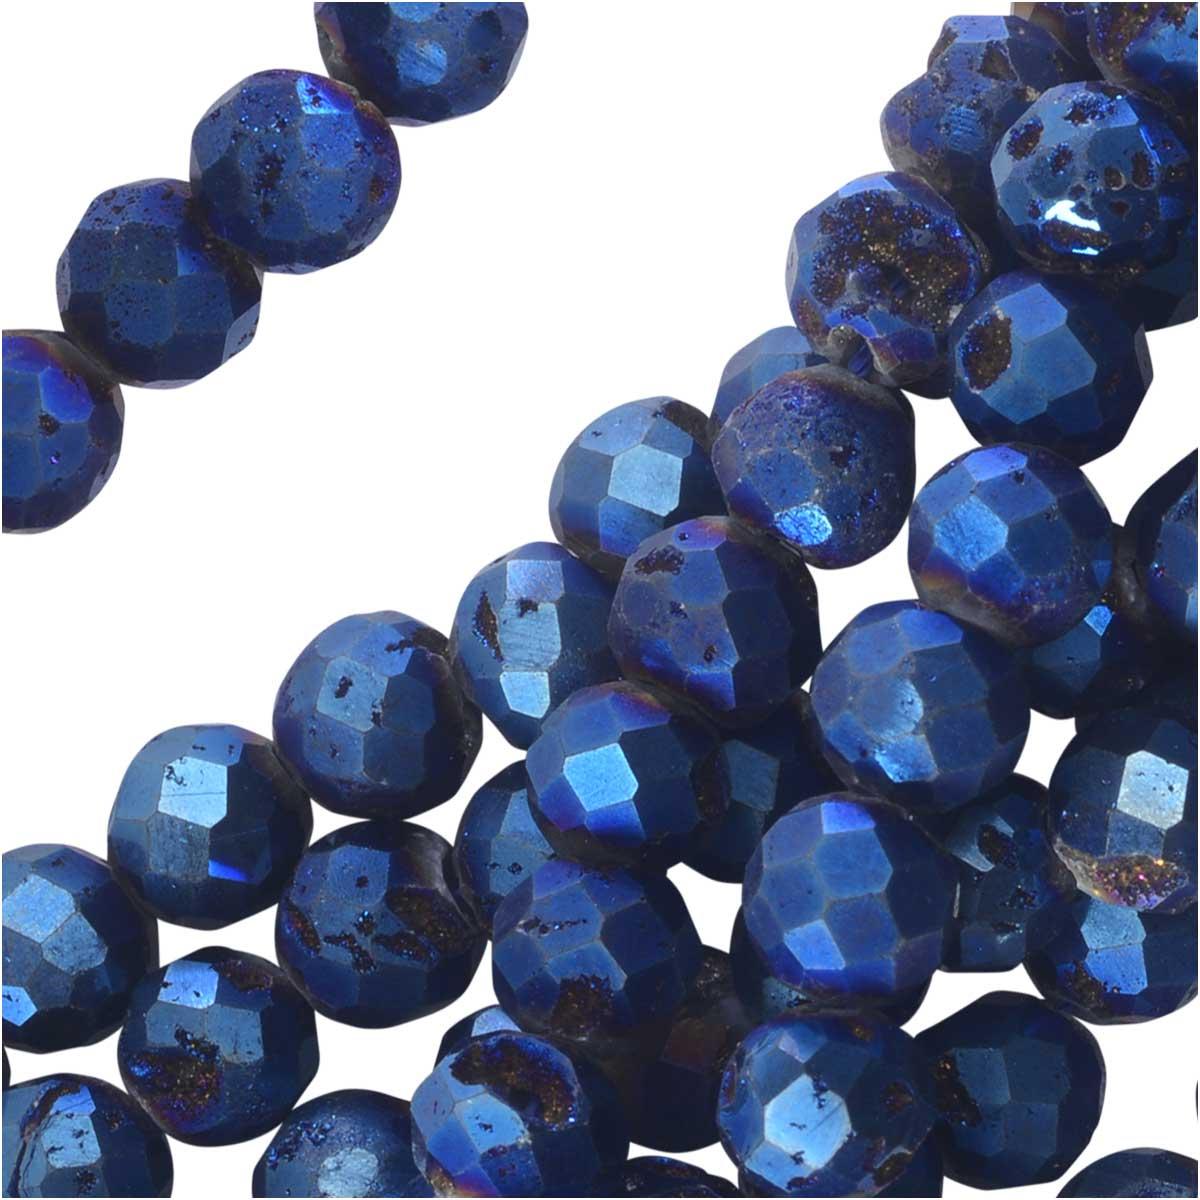 Dakota Stones Gemstone Beads, Agate Geode Druzy, Faceted Round 6mm, 8 Inch Strand, Iridescent Blue